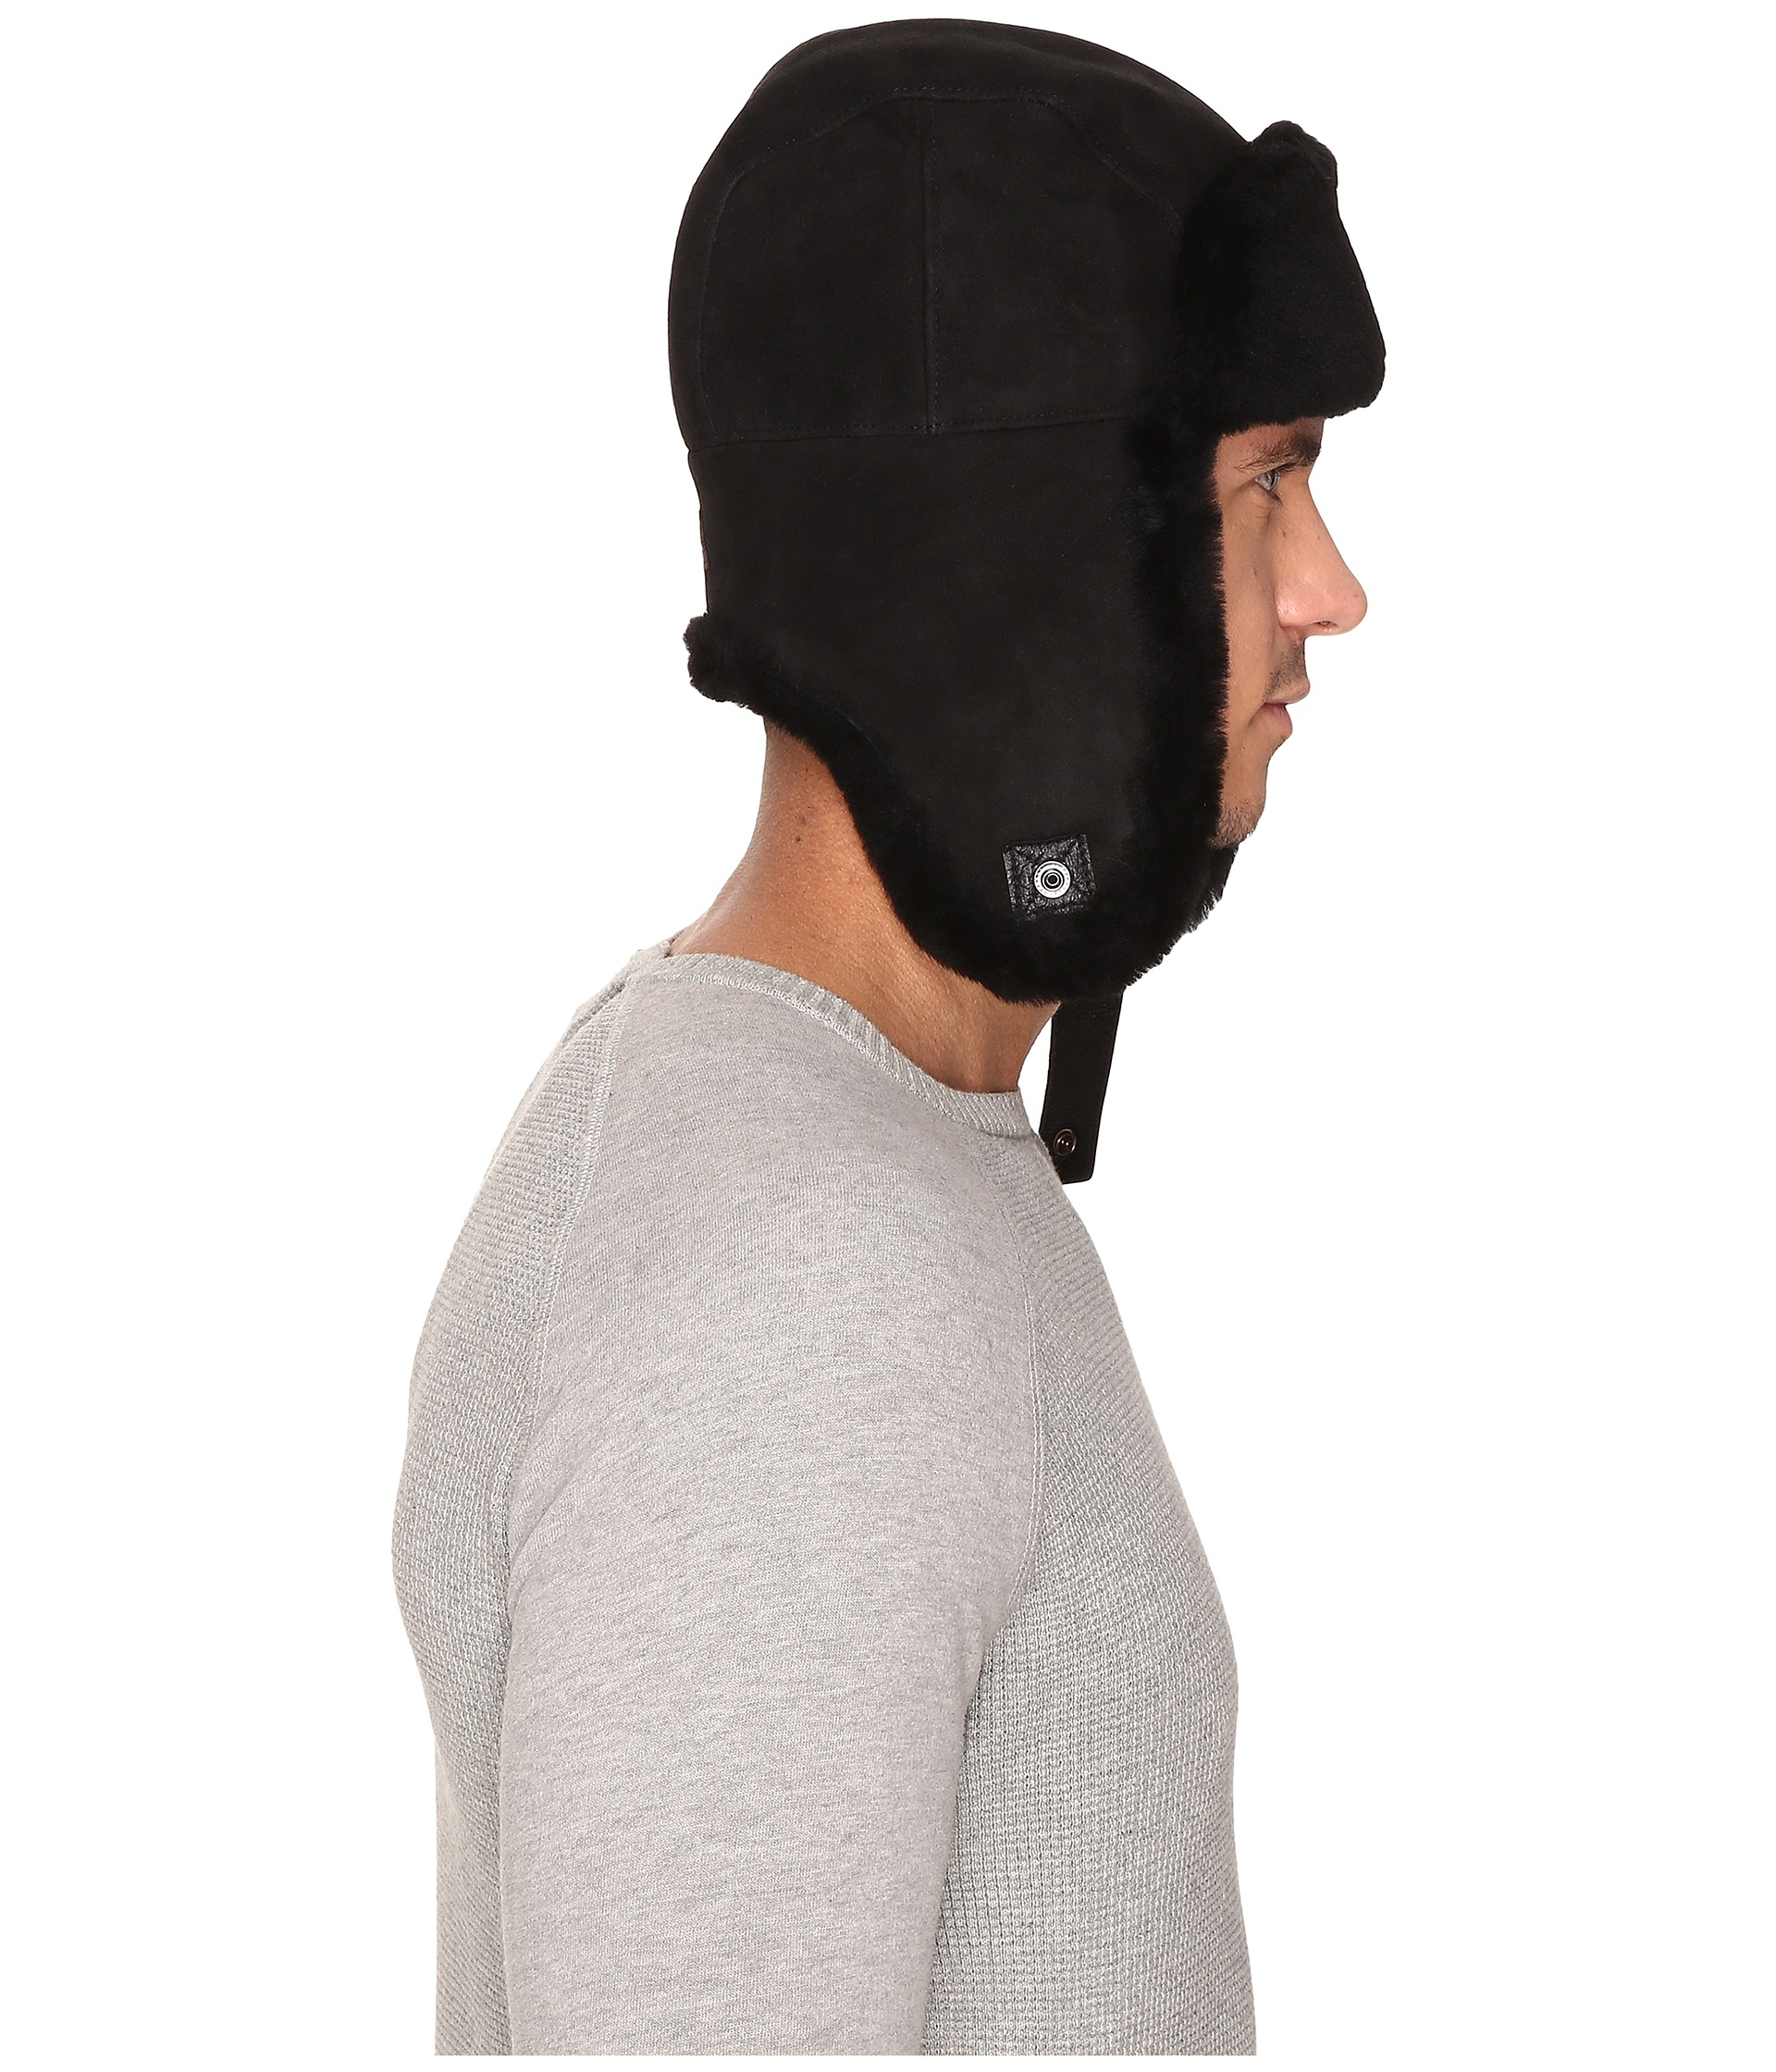 dbc47ea14 Ugg Trapper Hat Black